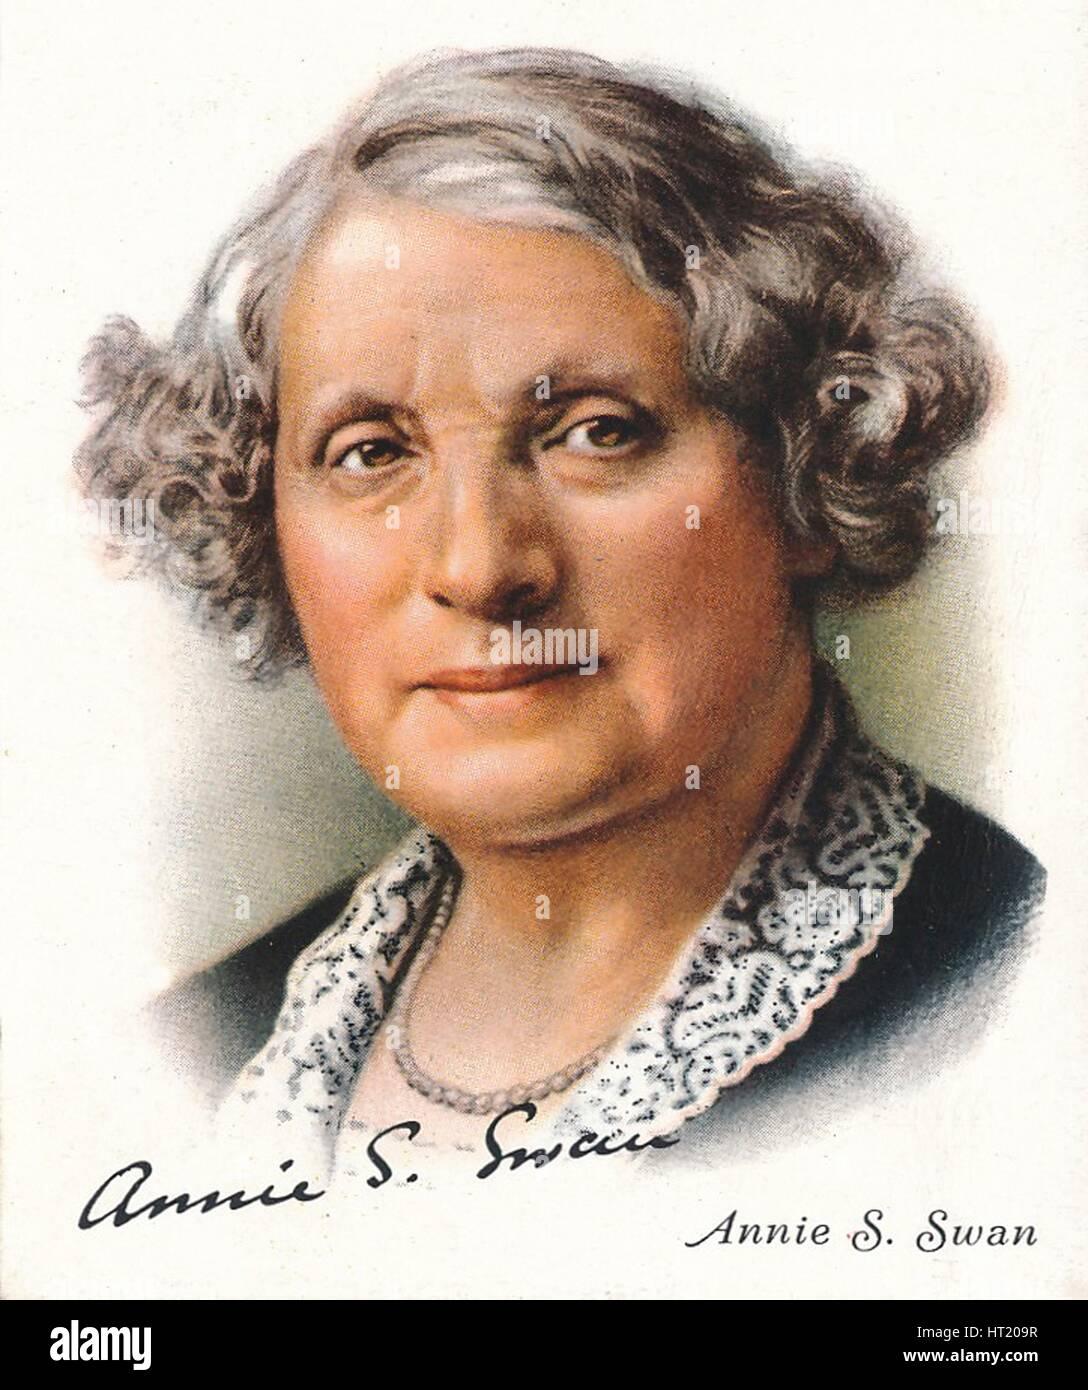 Annie S Swan, 1937. Artiste: Inconnu. Banque D'Images